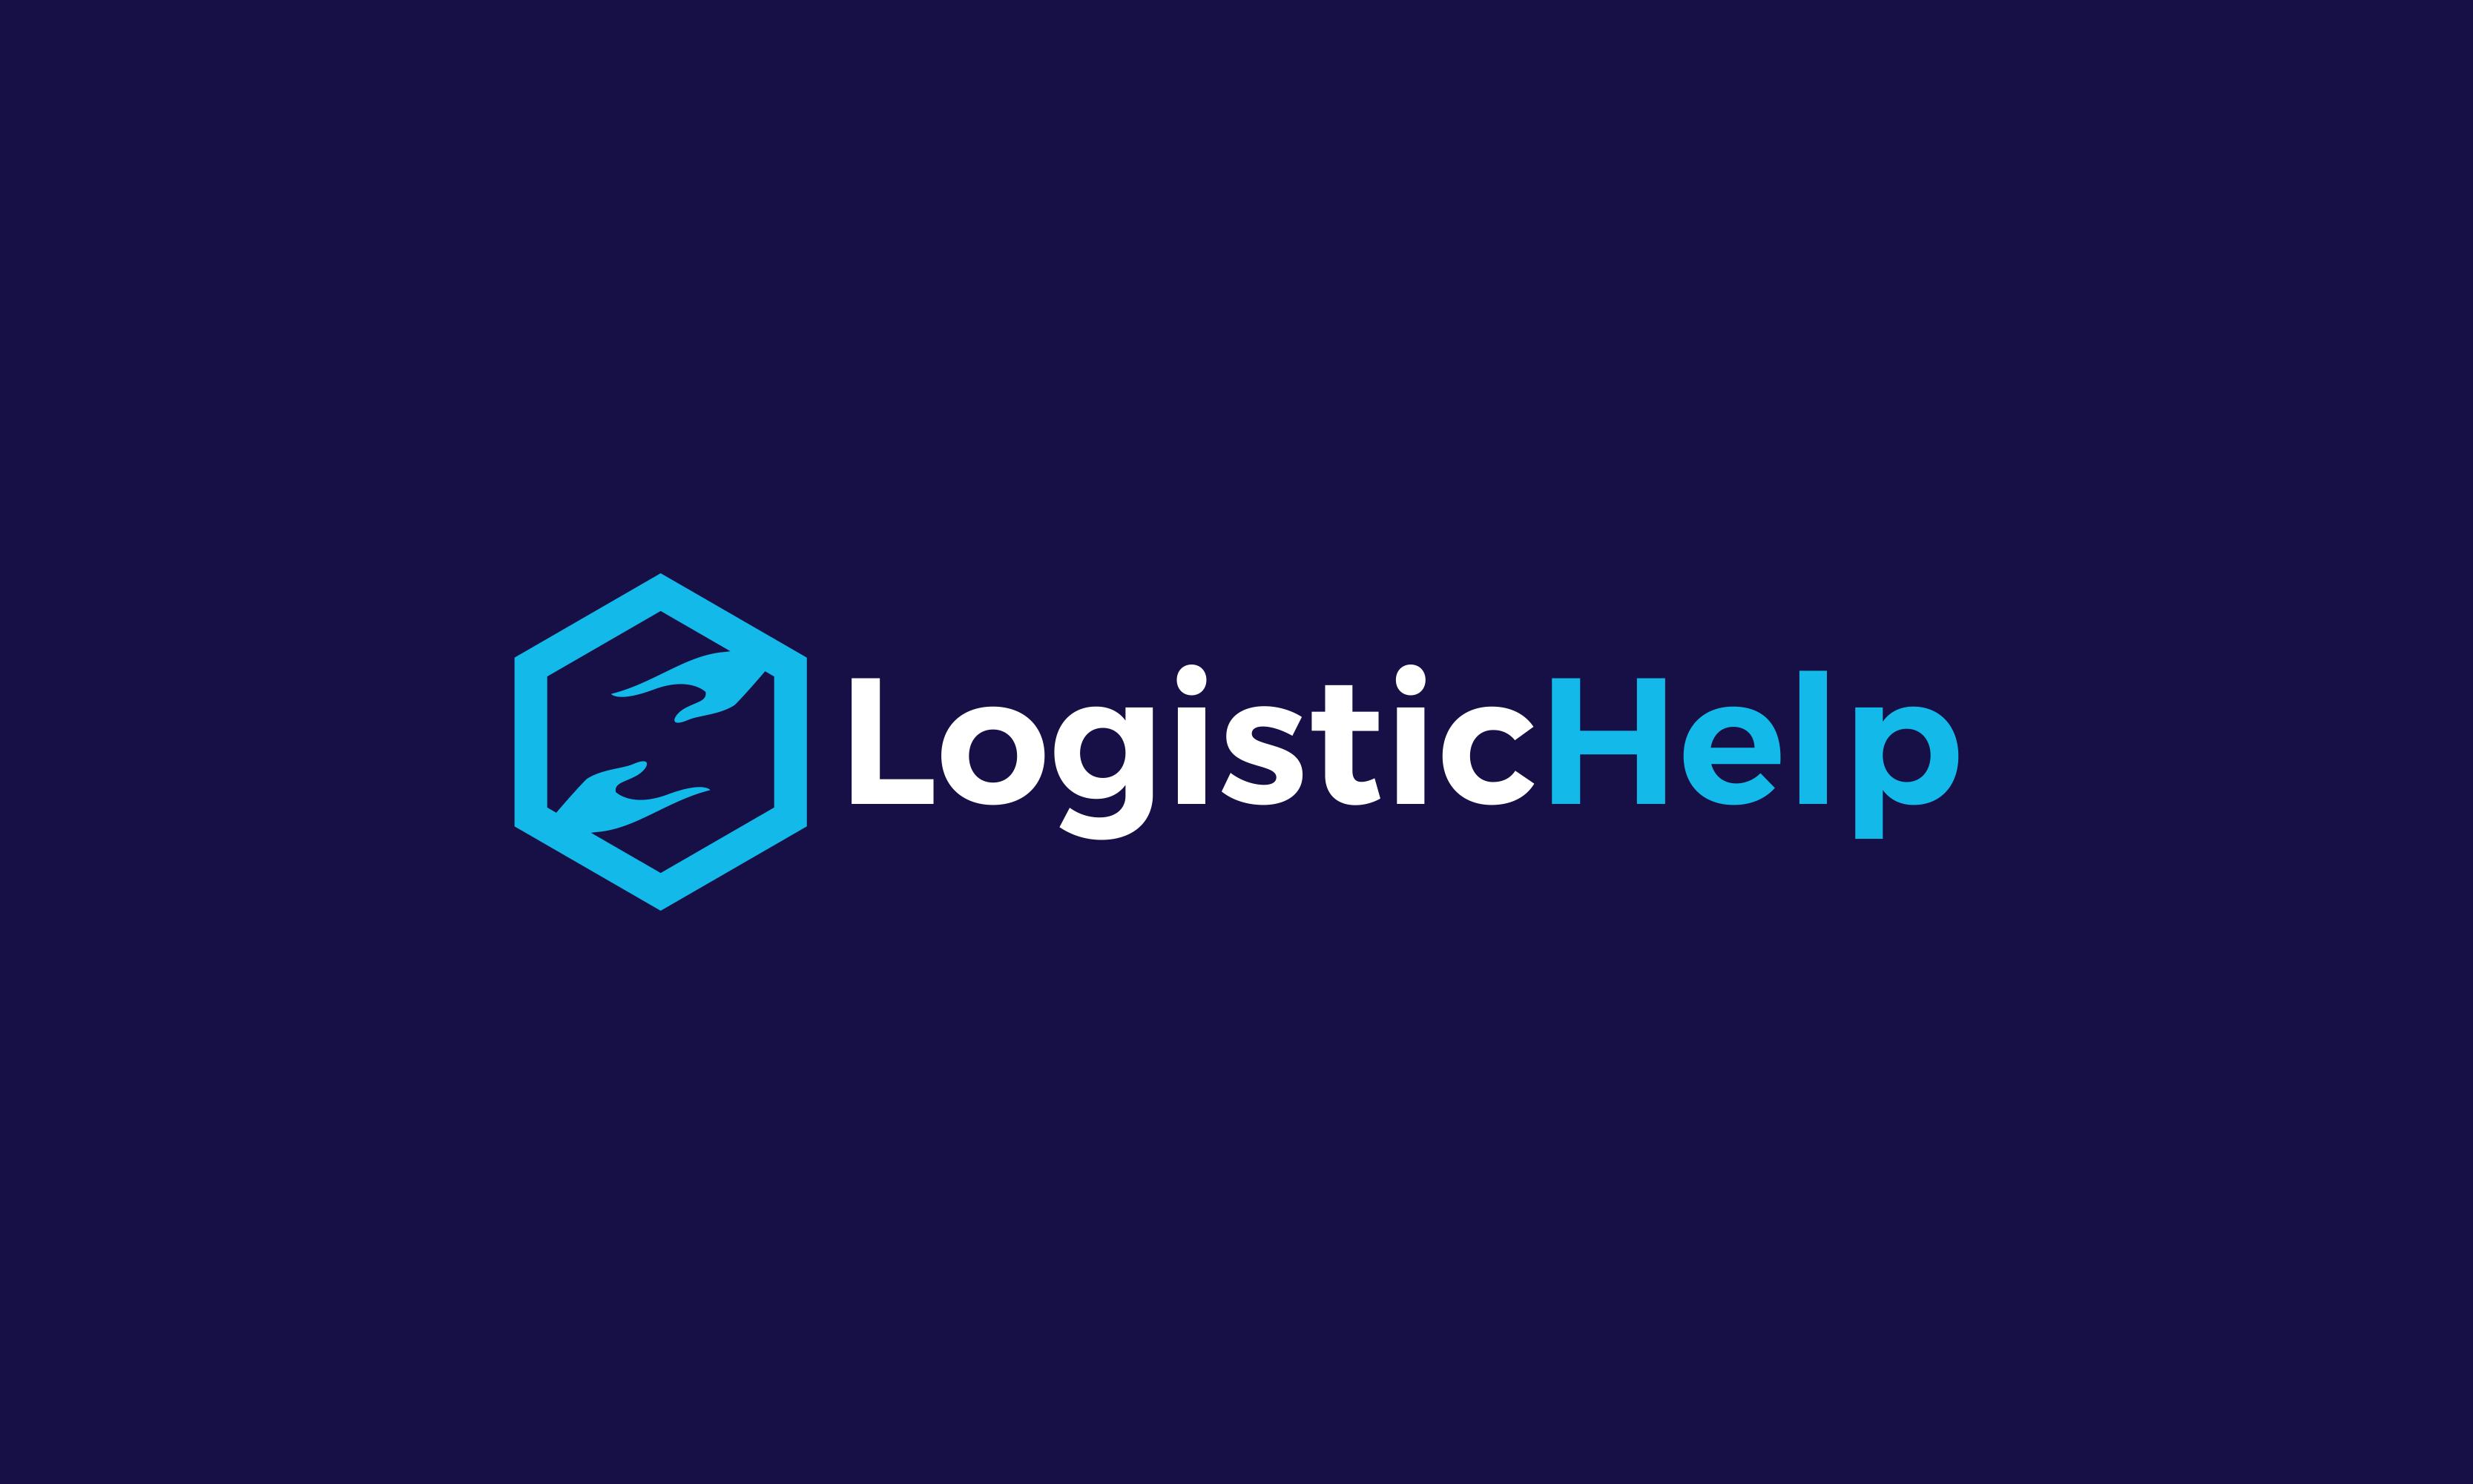 Logistichelp